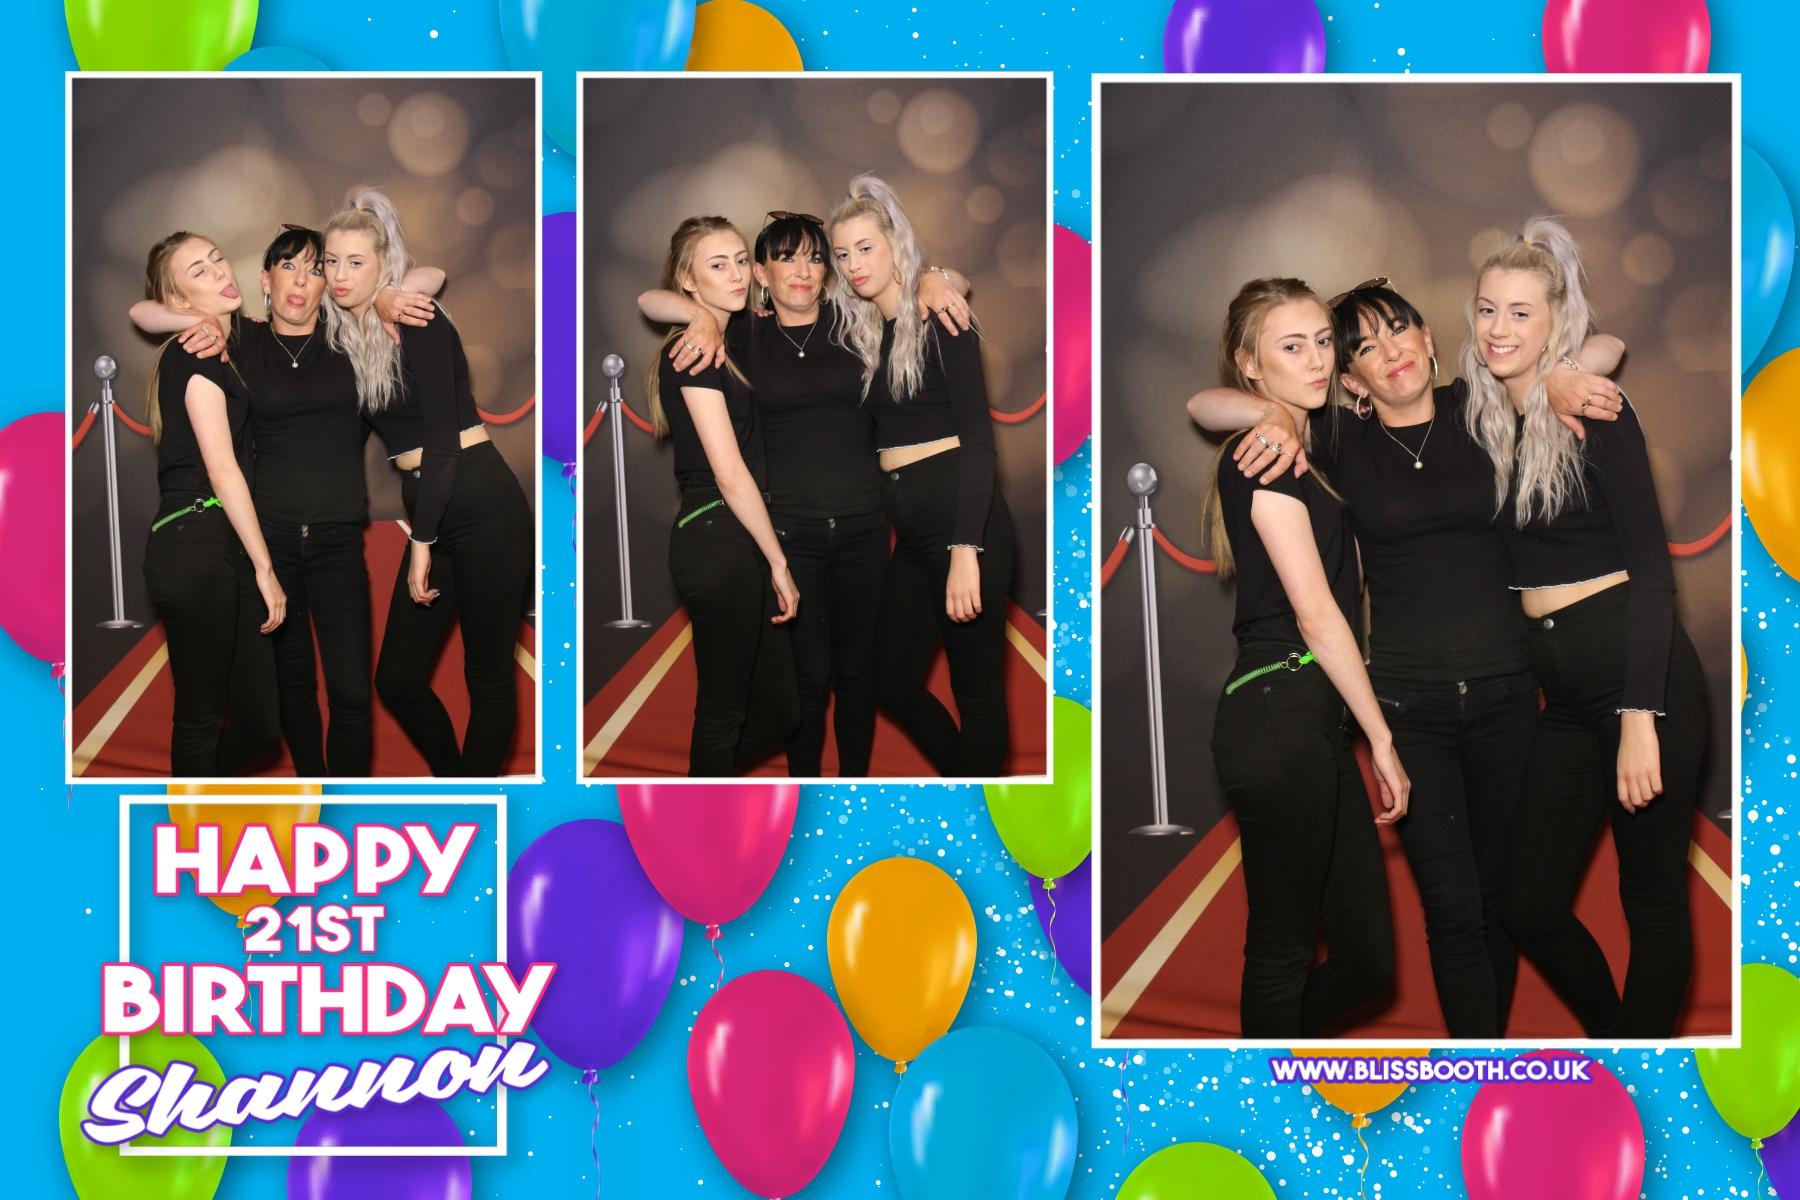 Shannons 21st birthday - Que Gardens Bradford - Magic Mirror Photo Booth